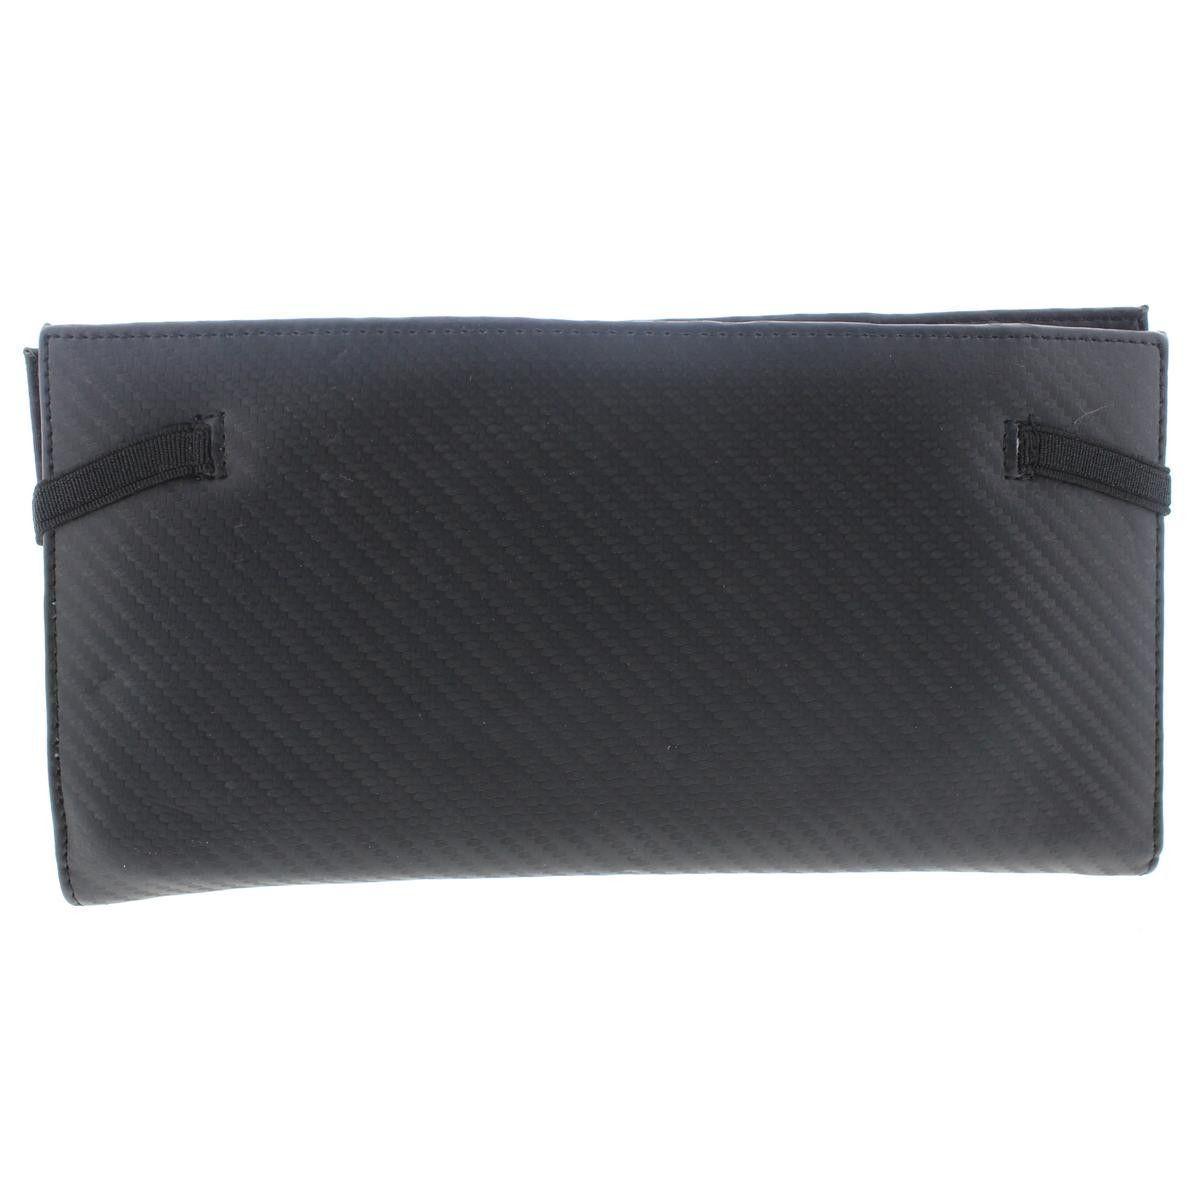 Zara Mens Faux Leather Textured Traveler Wallet